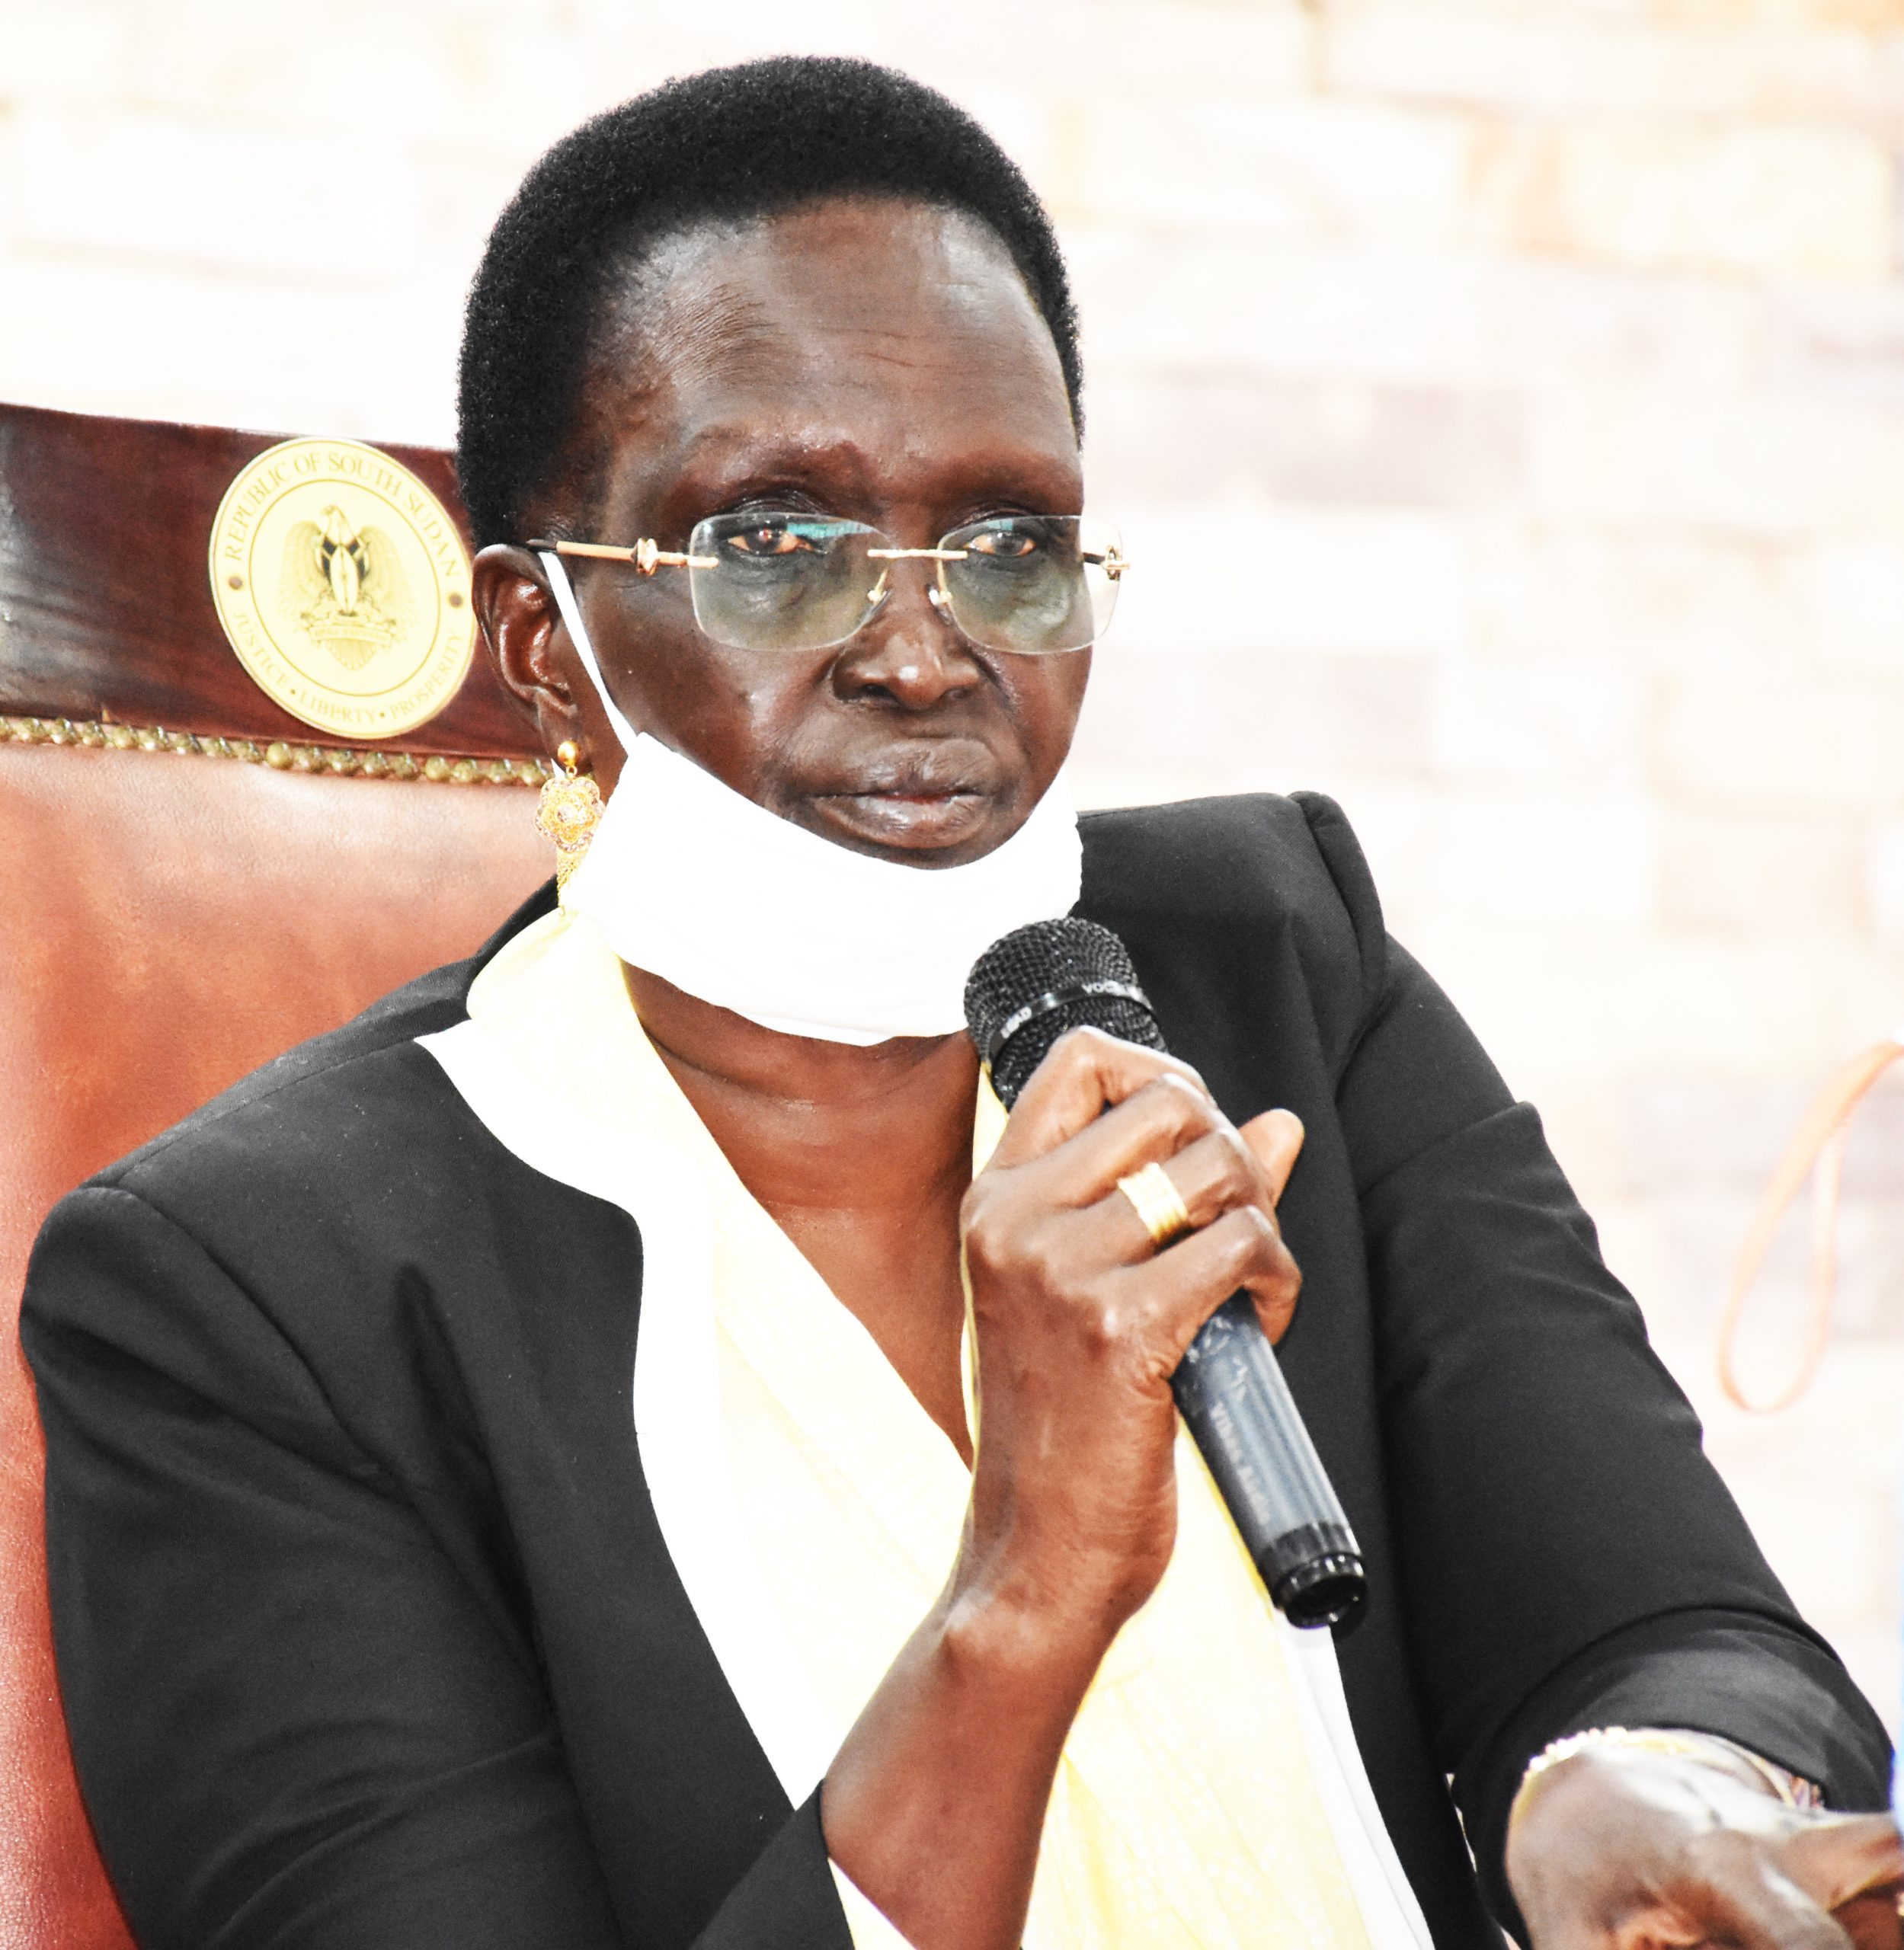 Nyandeng urges international community to empower youths, women